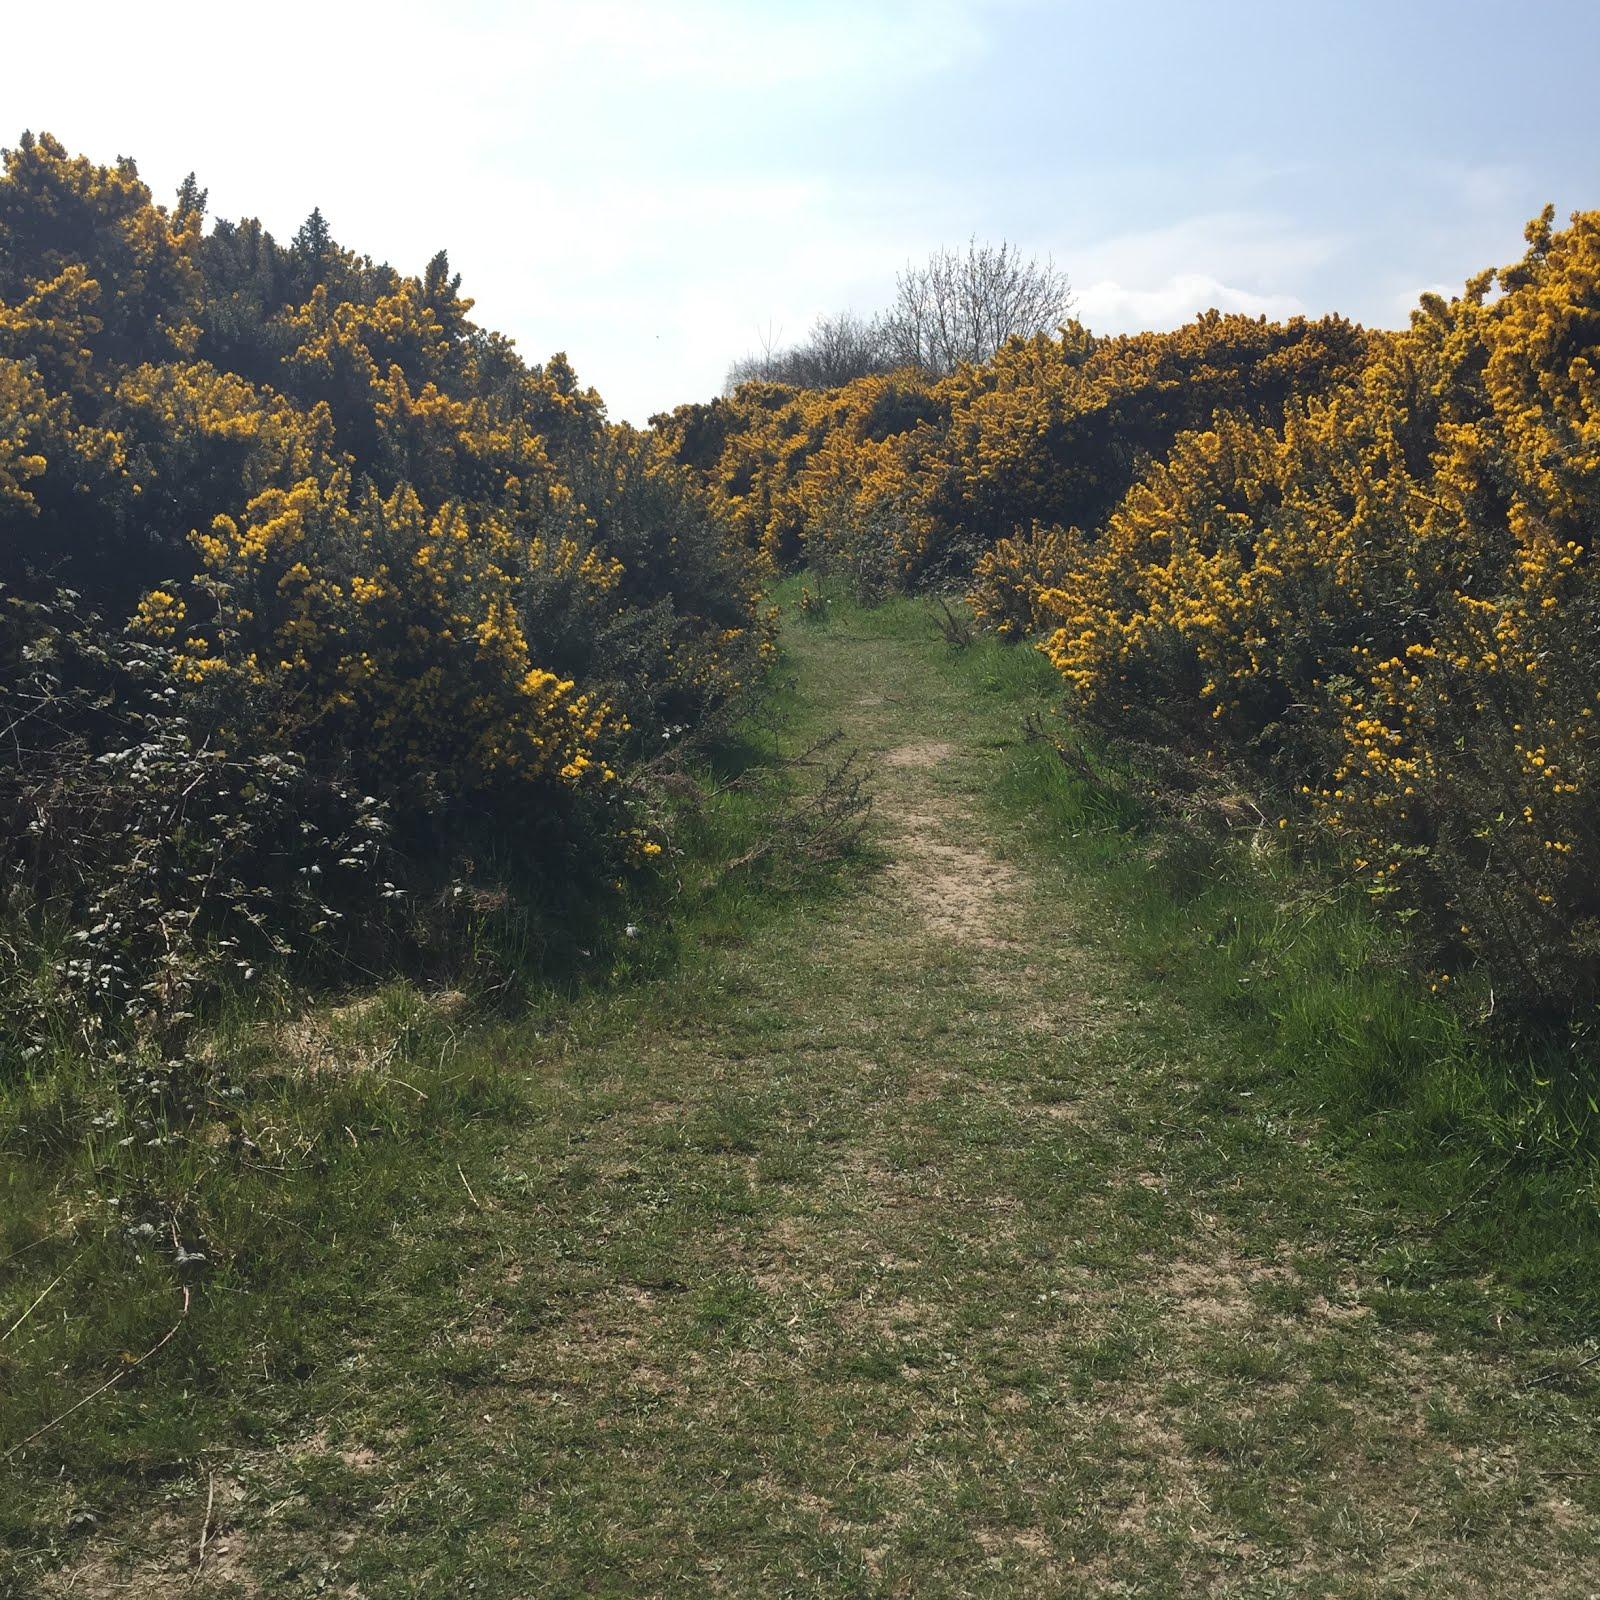 The road we walk